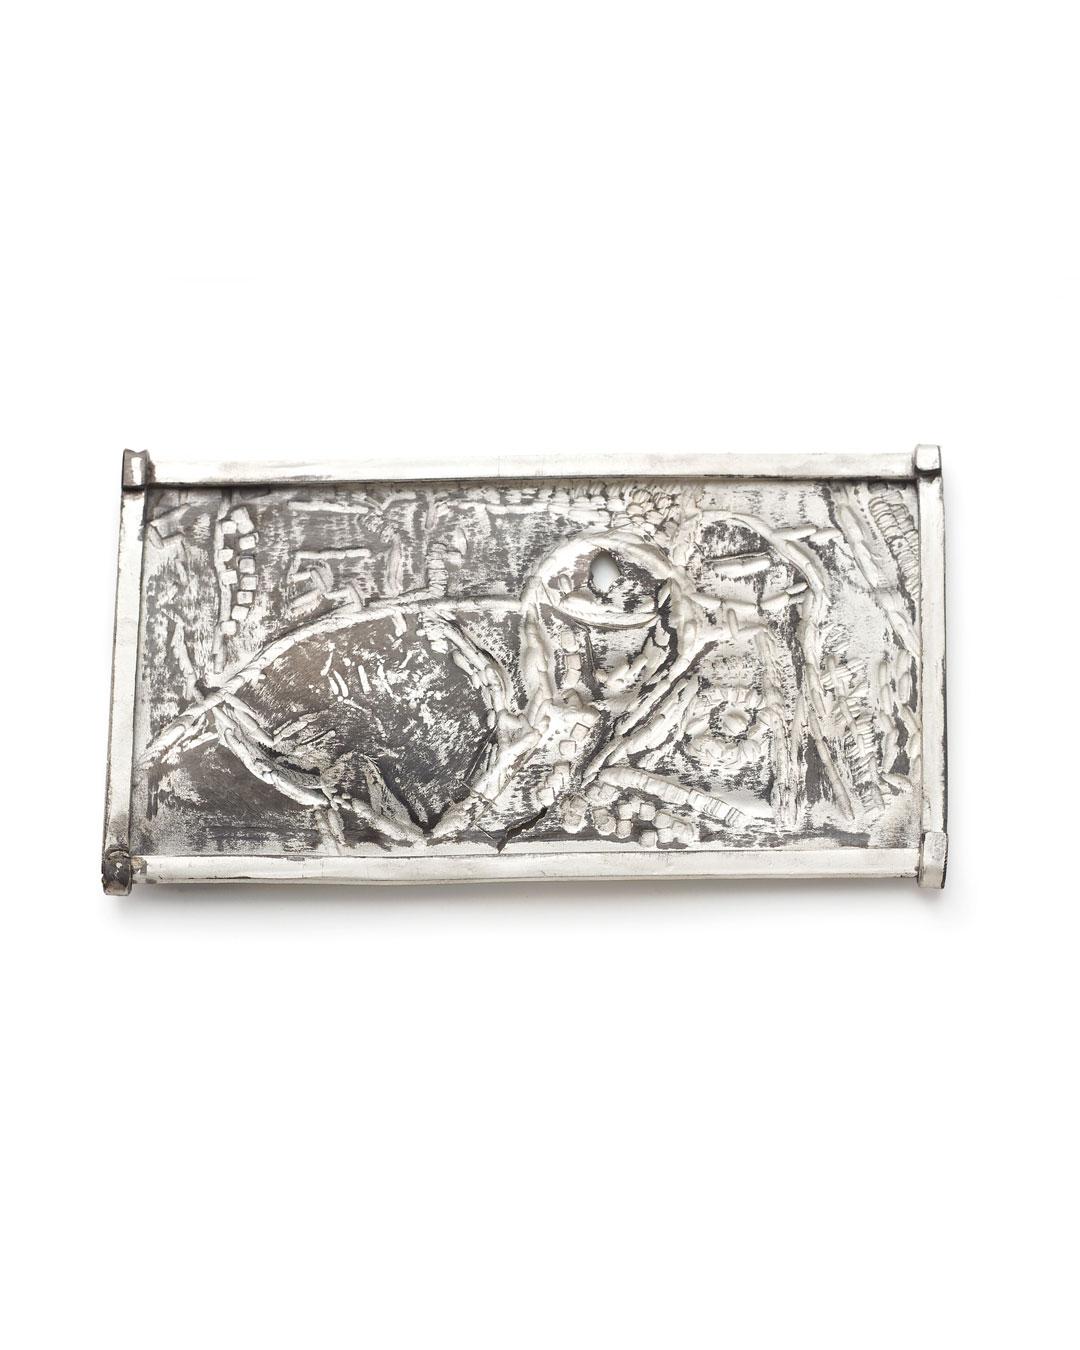 Rudolf Kocéa, Andreasfest (St. Andreasfeest), 2014, broche; zilver, koper, 60 x 115 x 8 mm, €1550